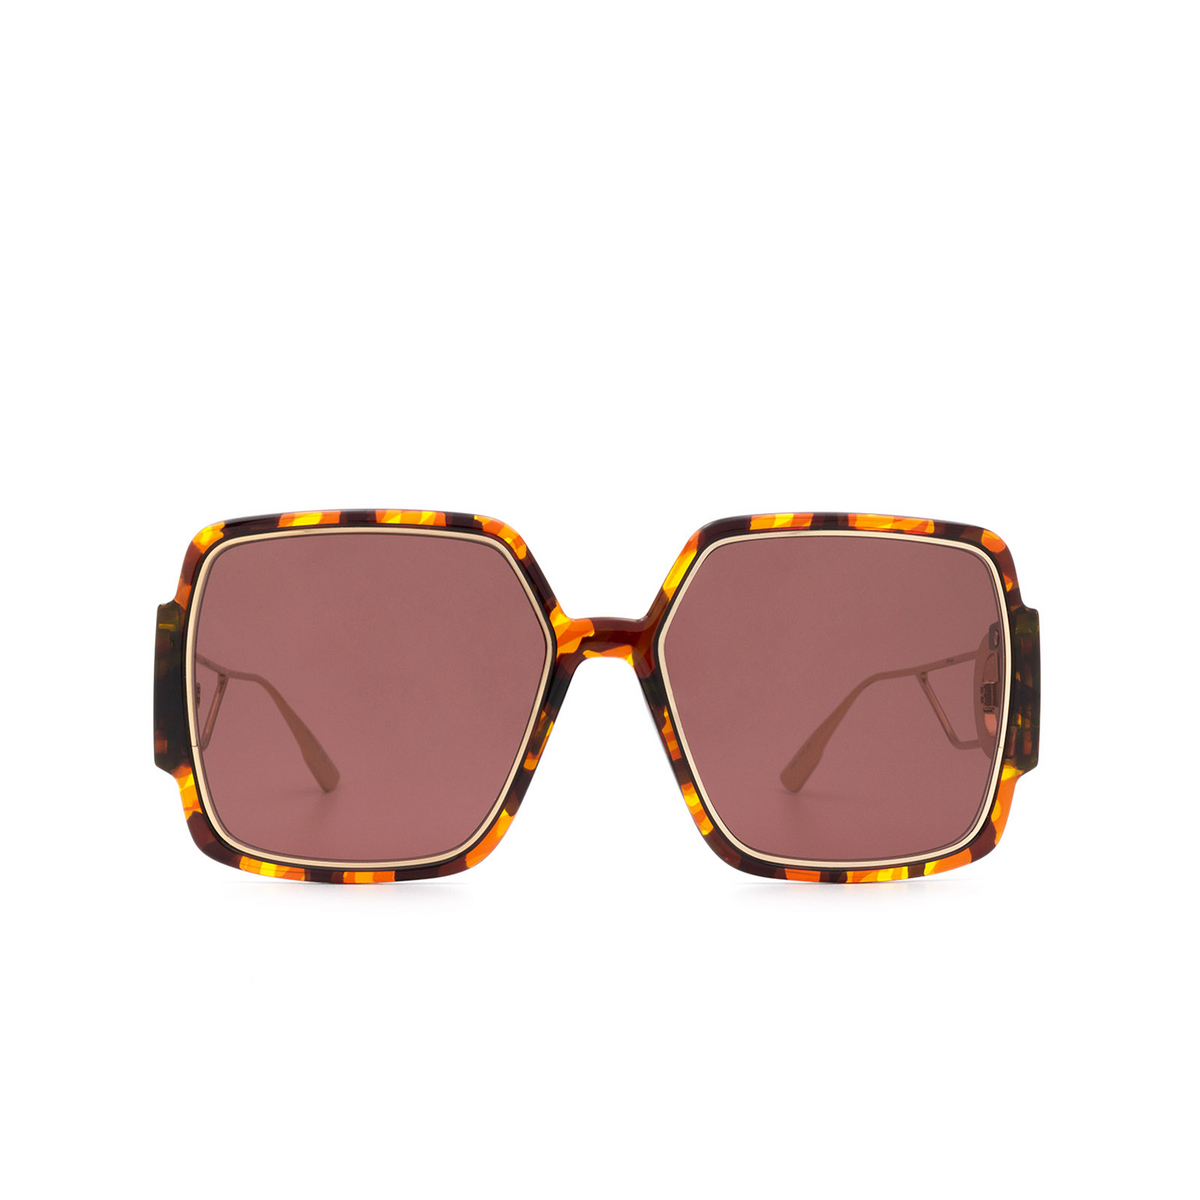 Dior® Square Sunglasses: 30MONTAIGNE2 color Havana EPZ/U1 - front view.